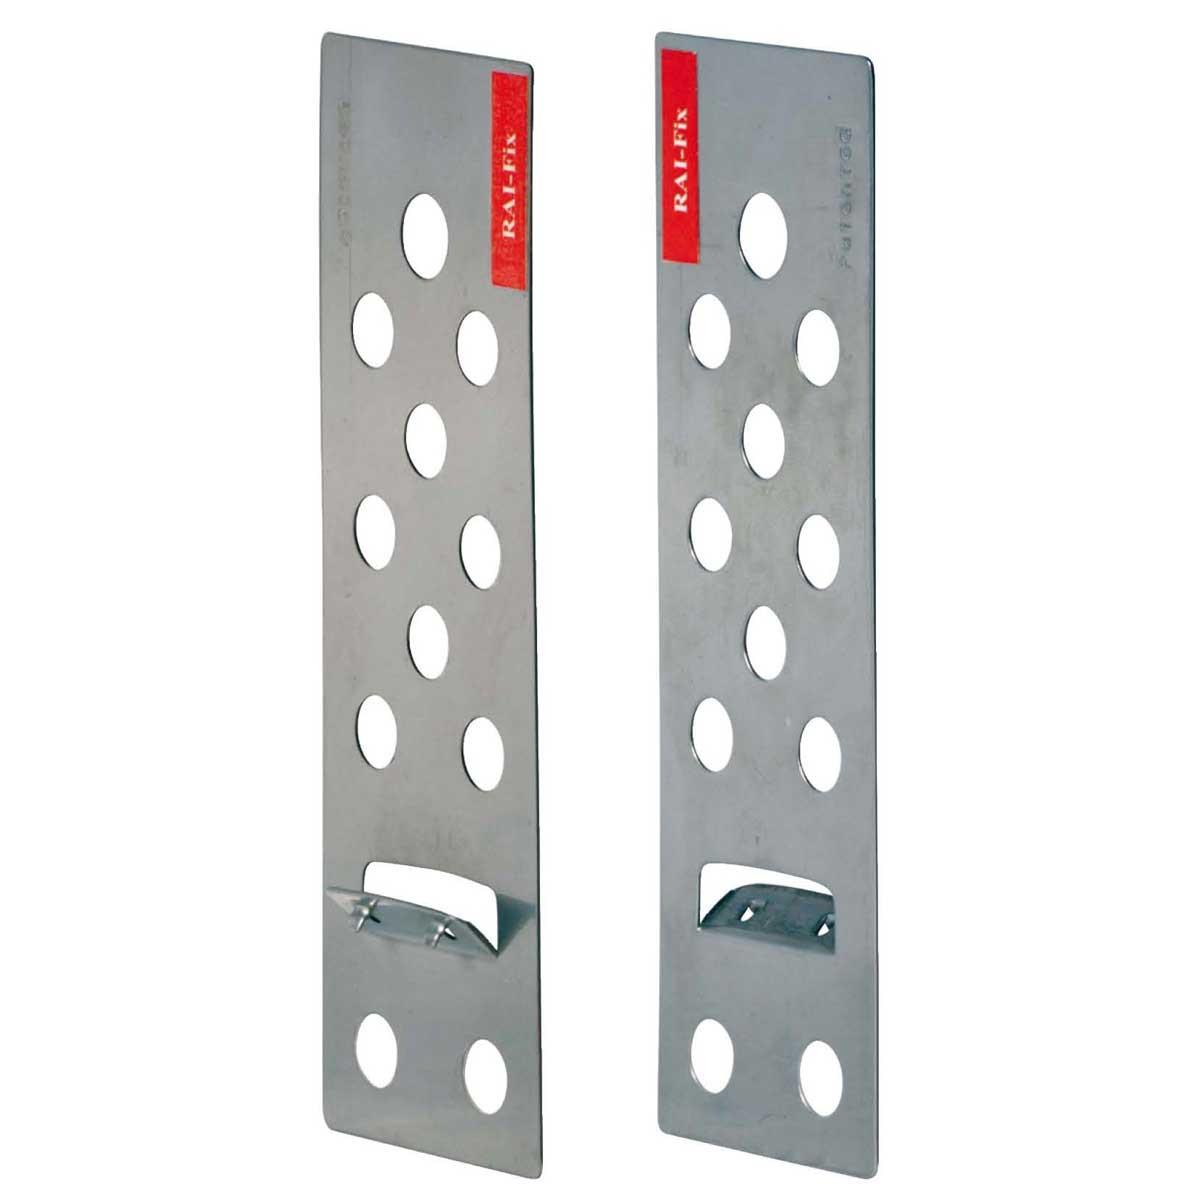 Raimondi Rai-Fix 8mm Tile Safety Withholding Hook